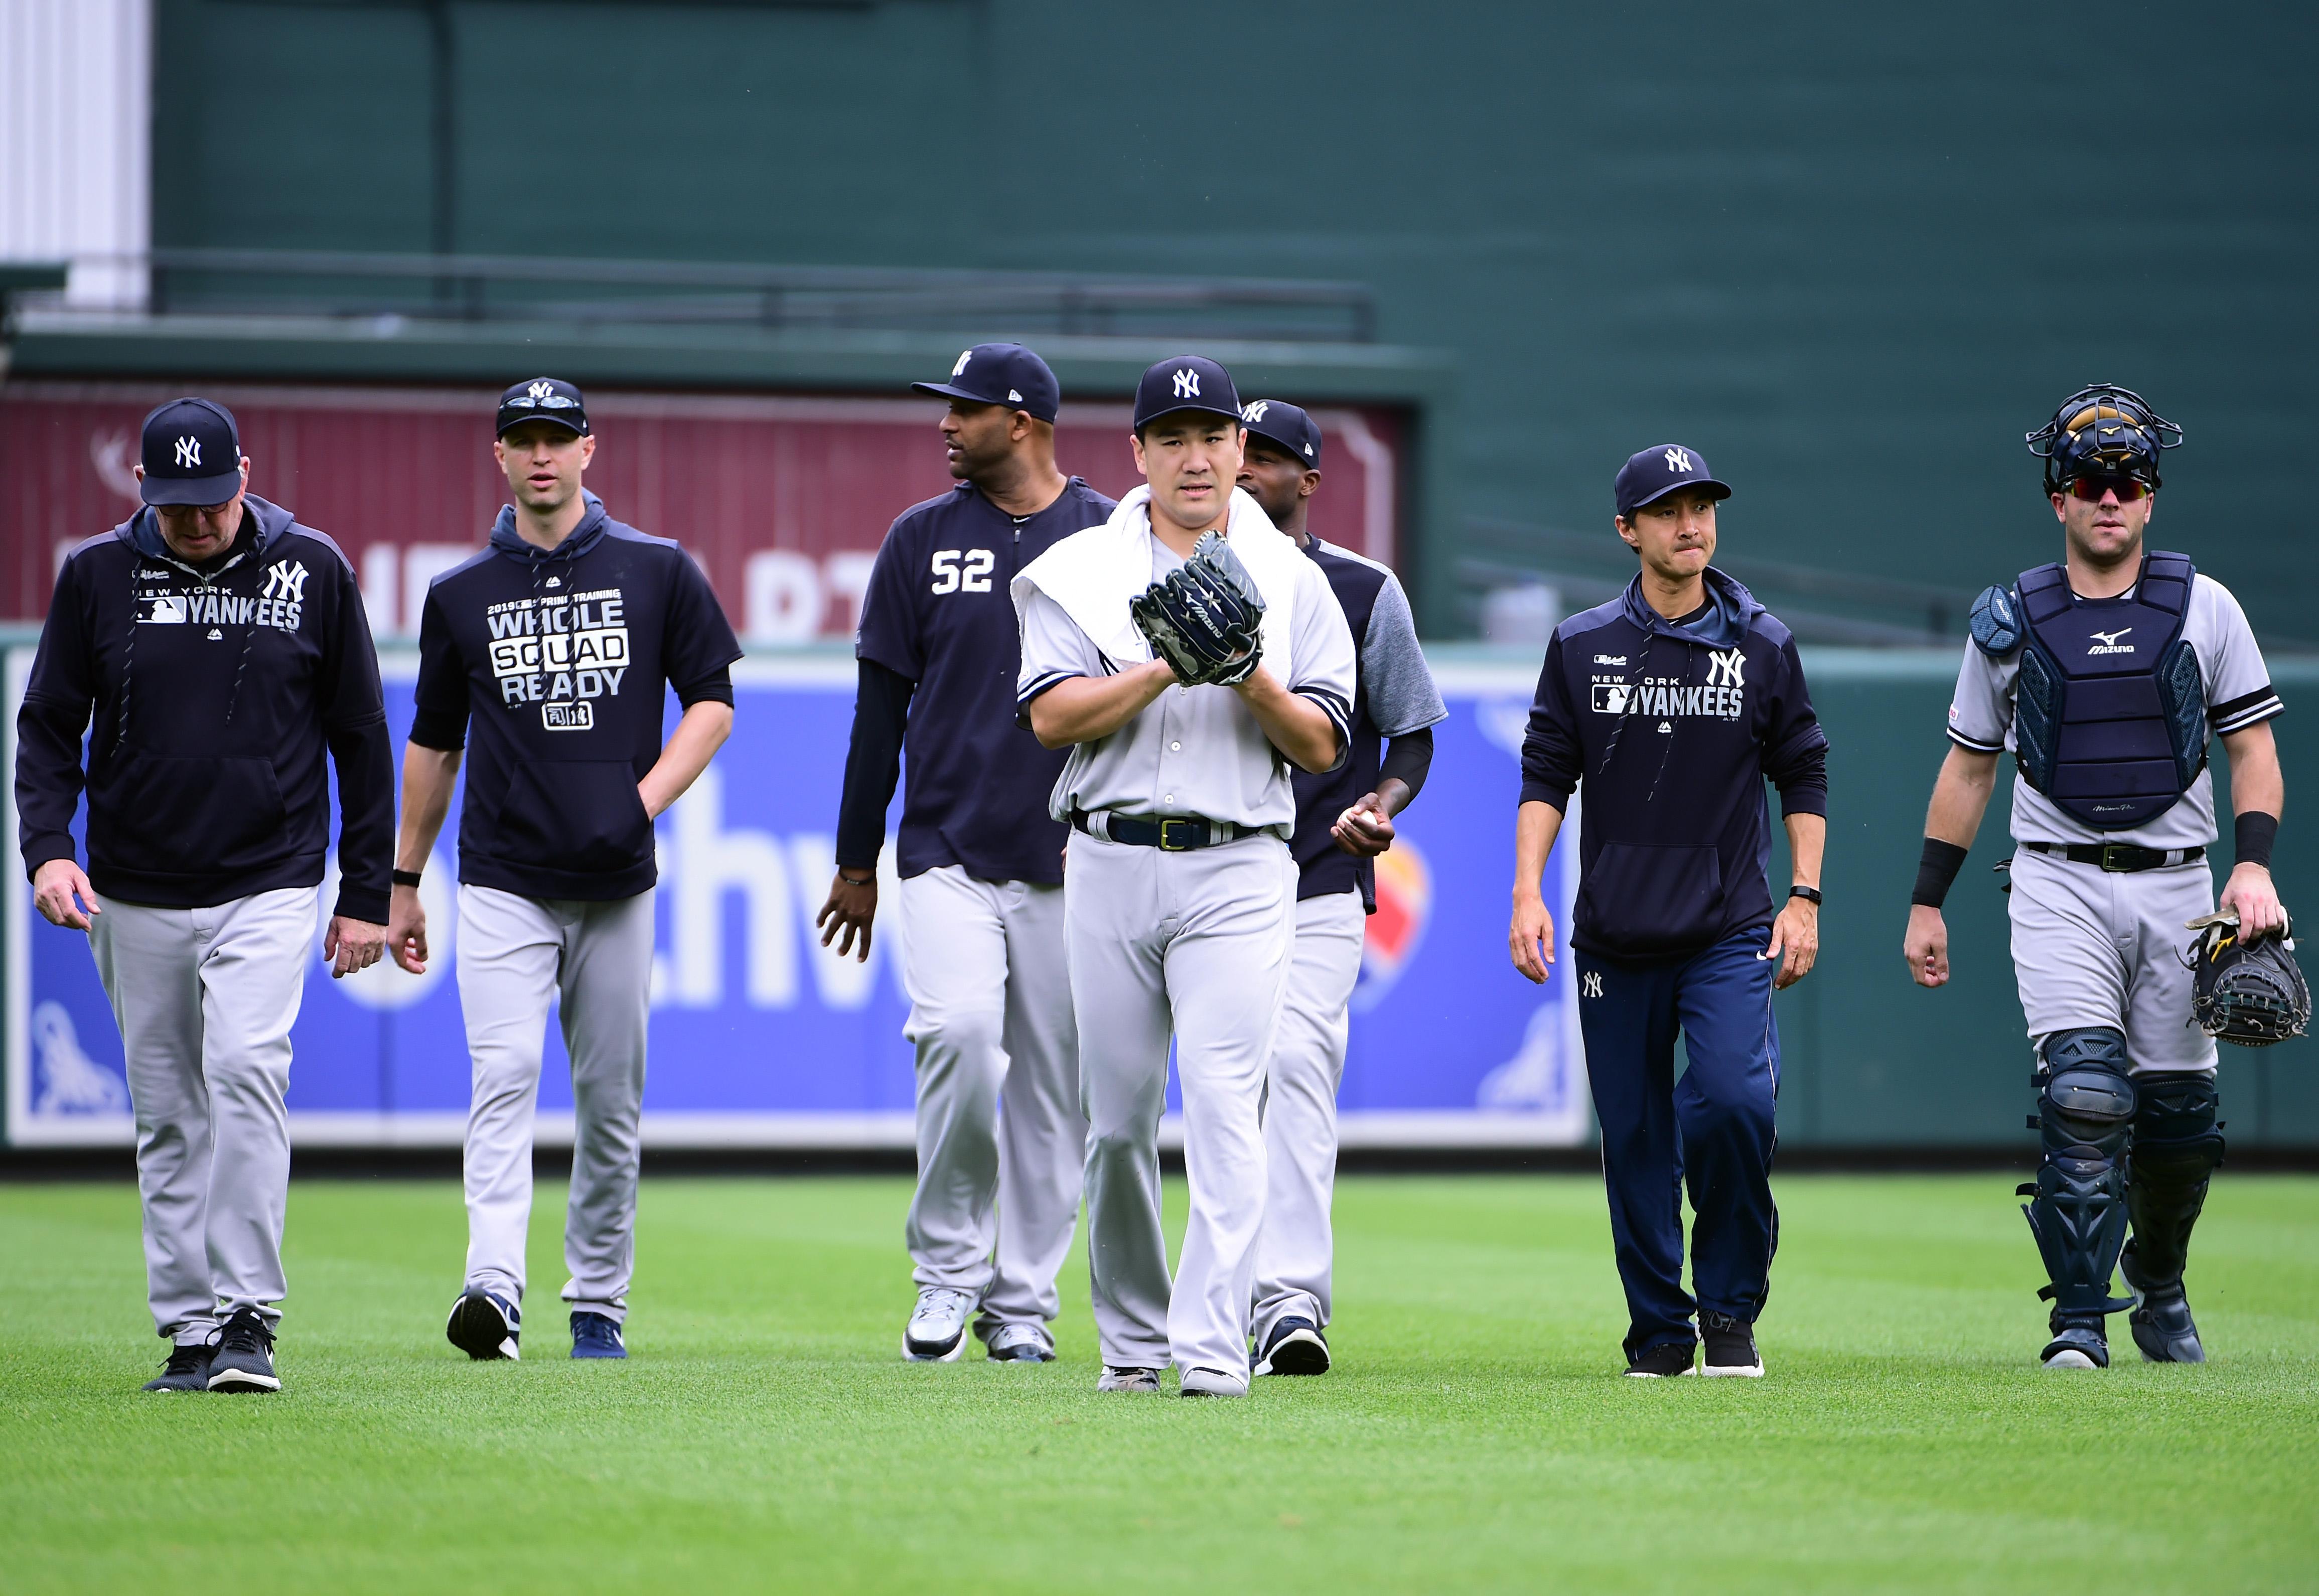 db1942dad New York Yankees vs. San Diego Padres  Series Preview